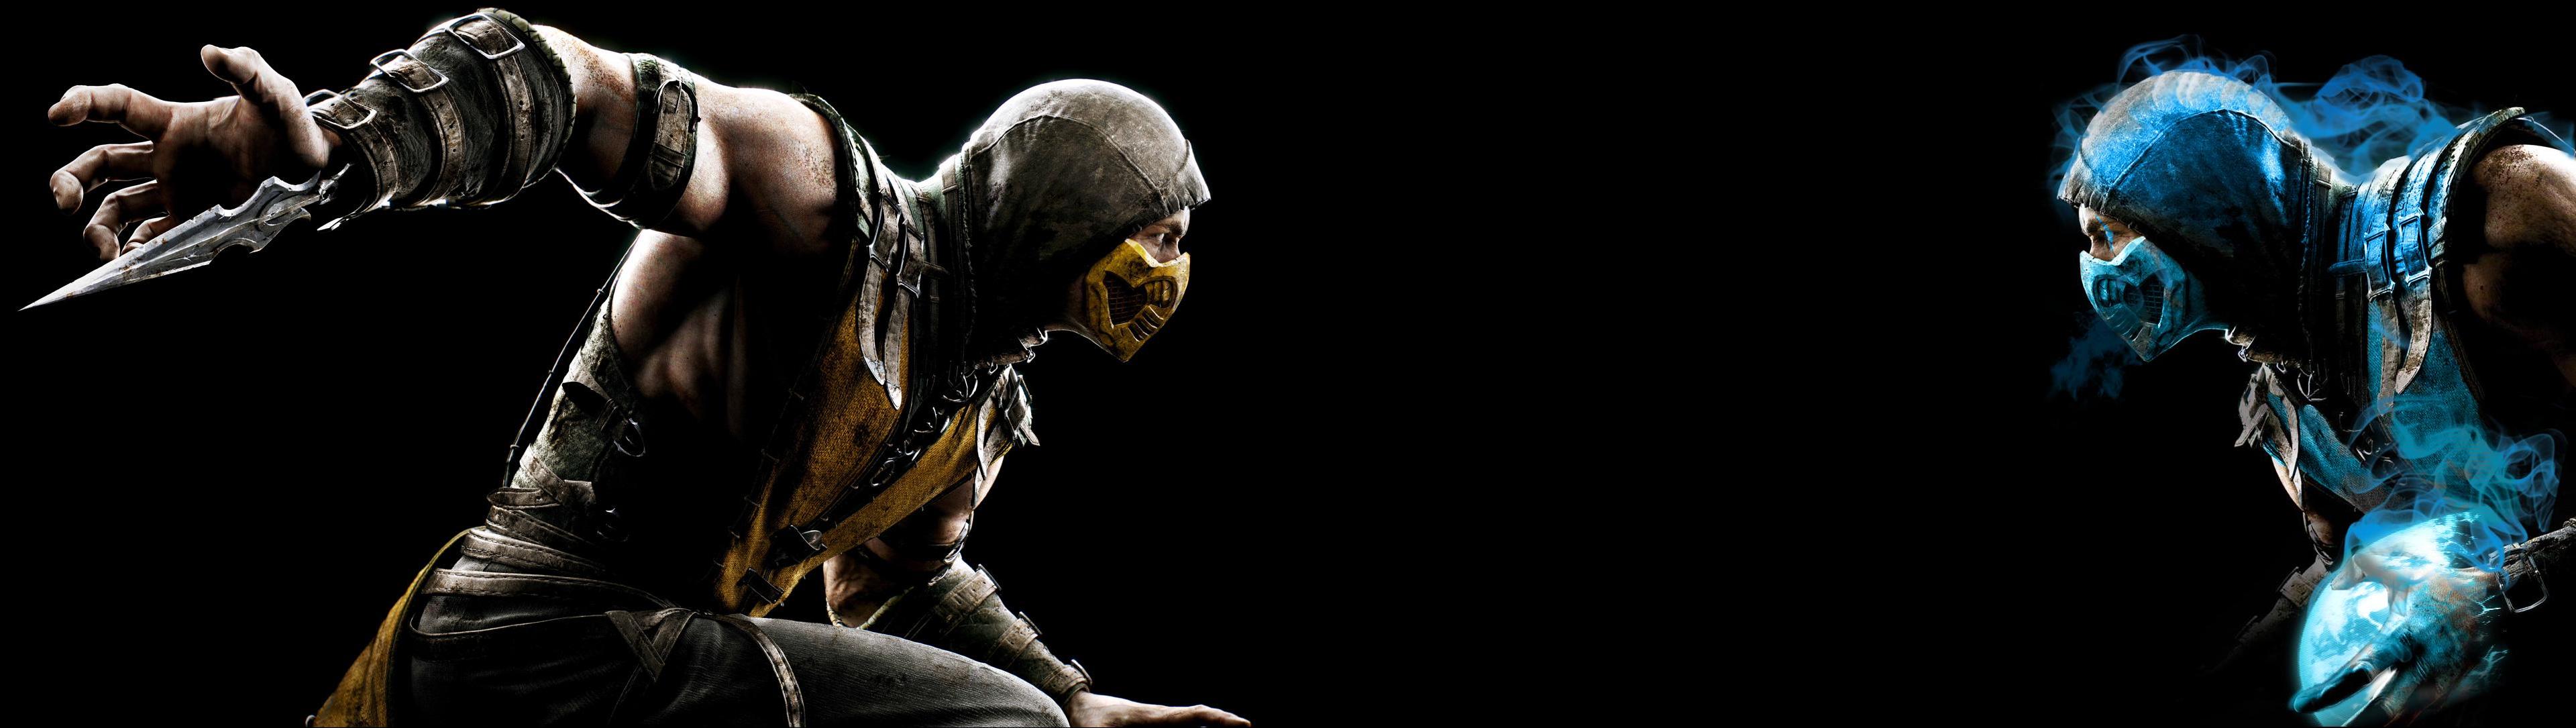 Wallpaper Mortal Kombat X Scorpion Character Sub Zero